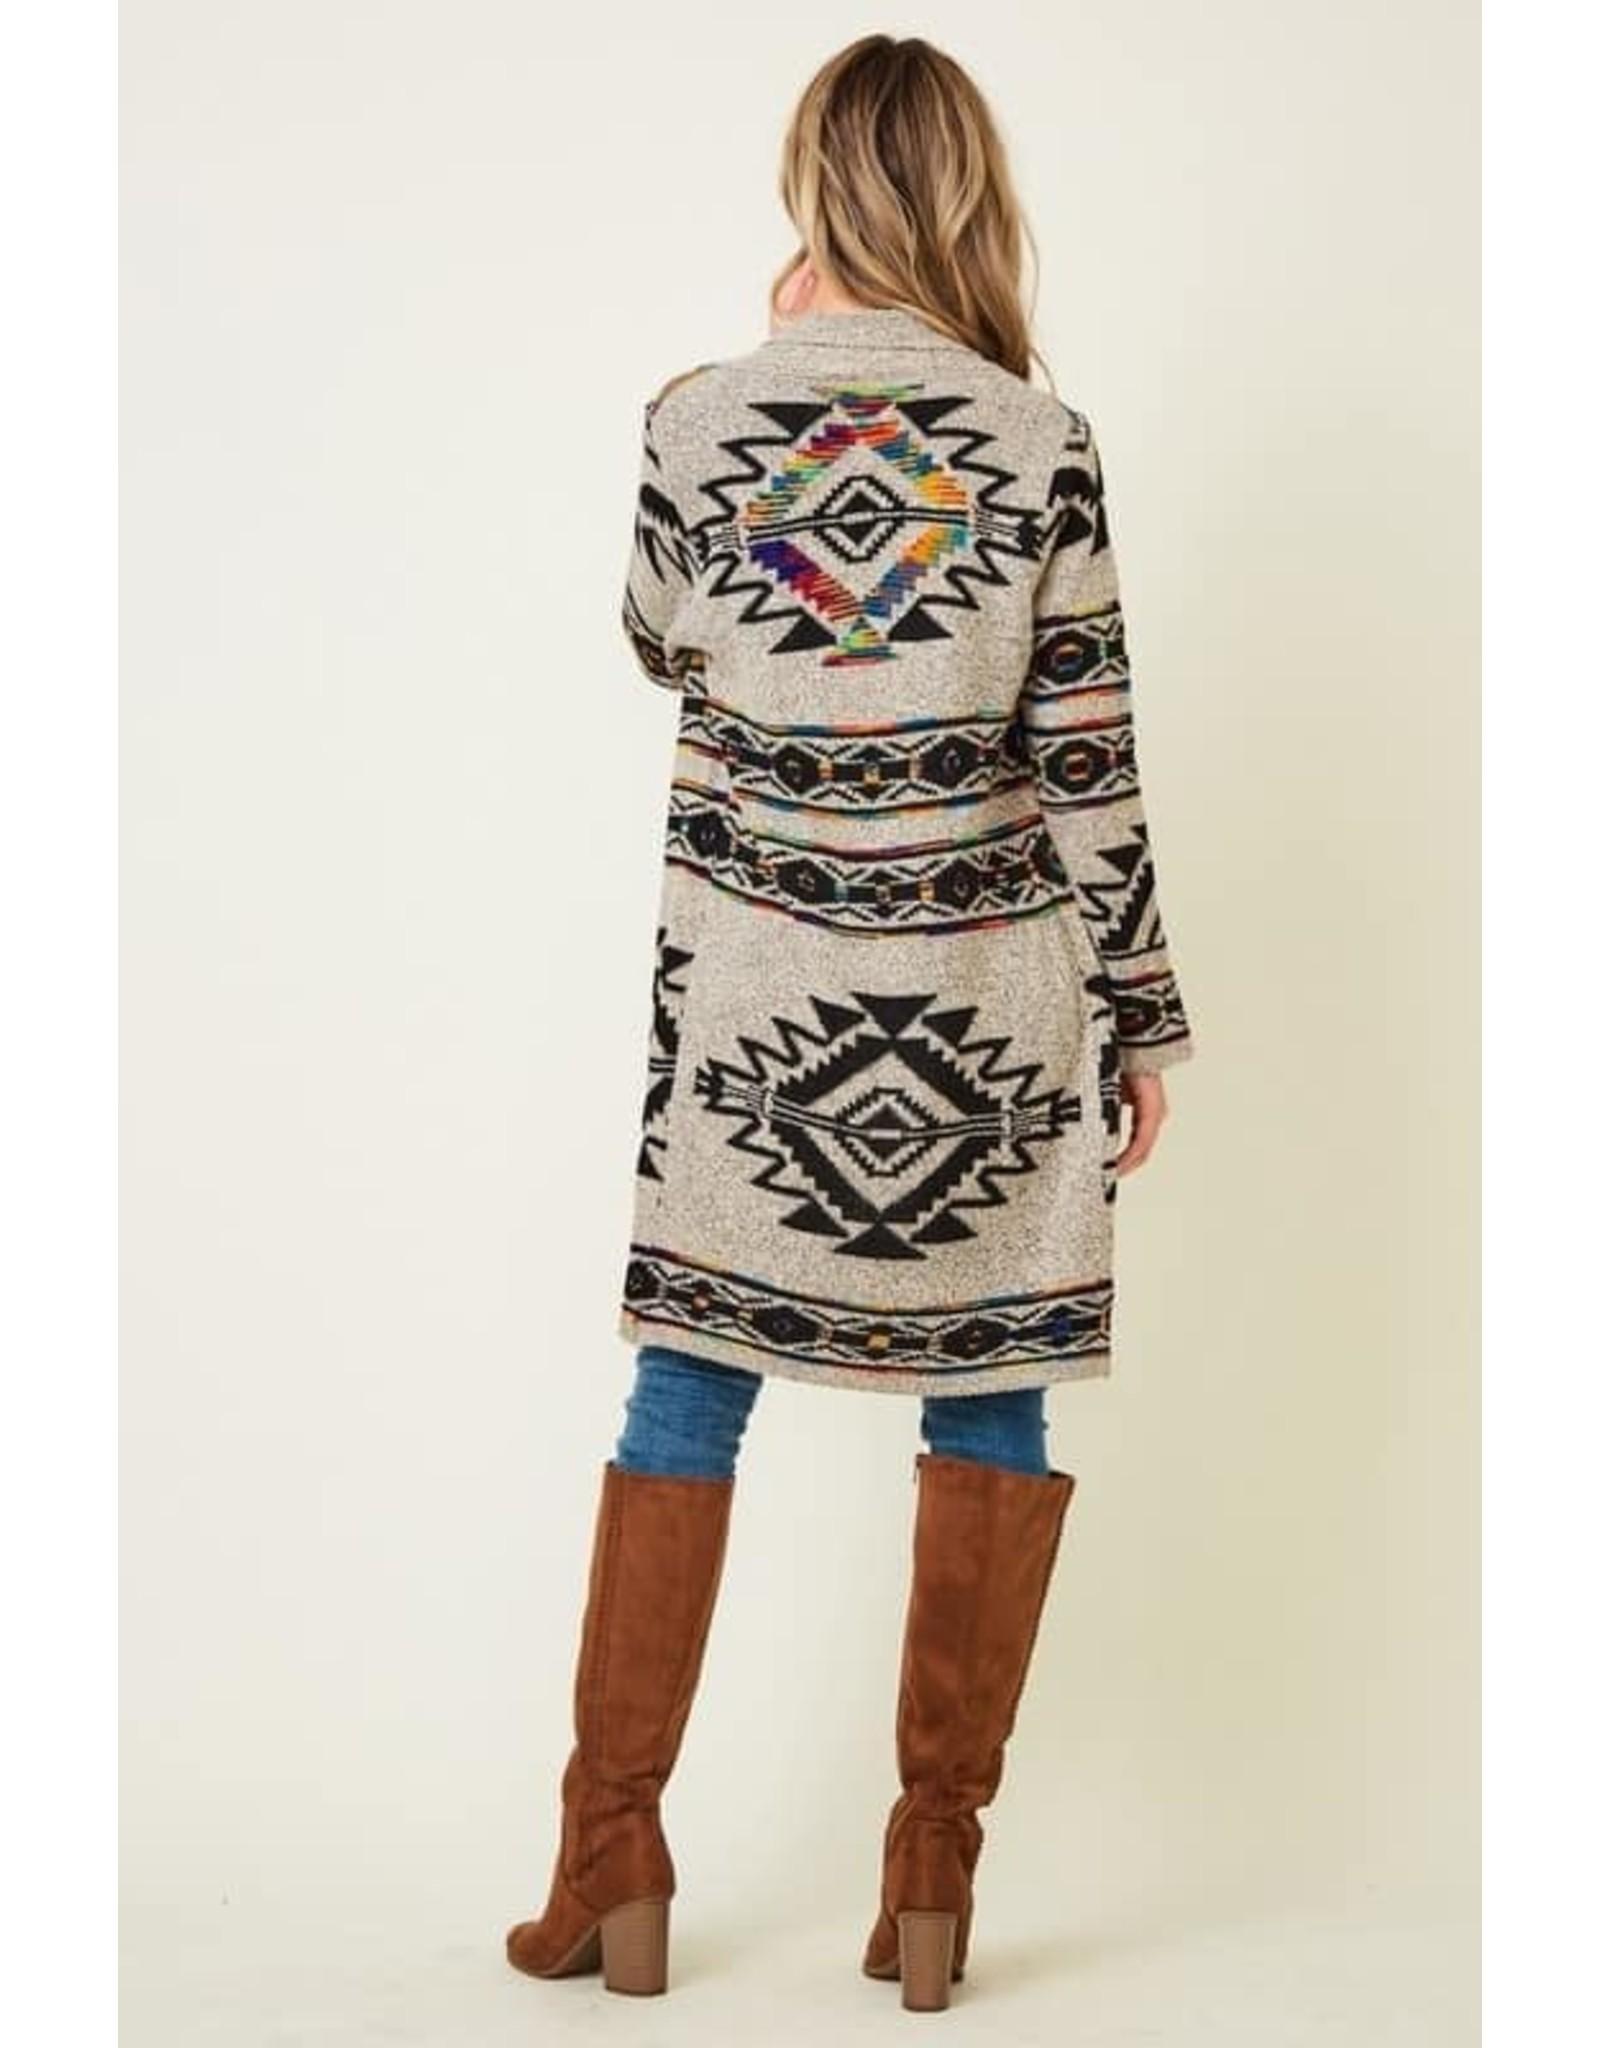 Rainbow Aztec Print Cardigan